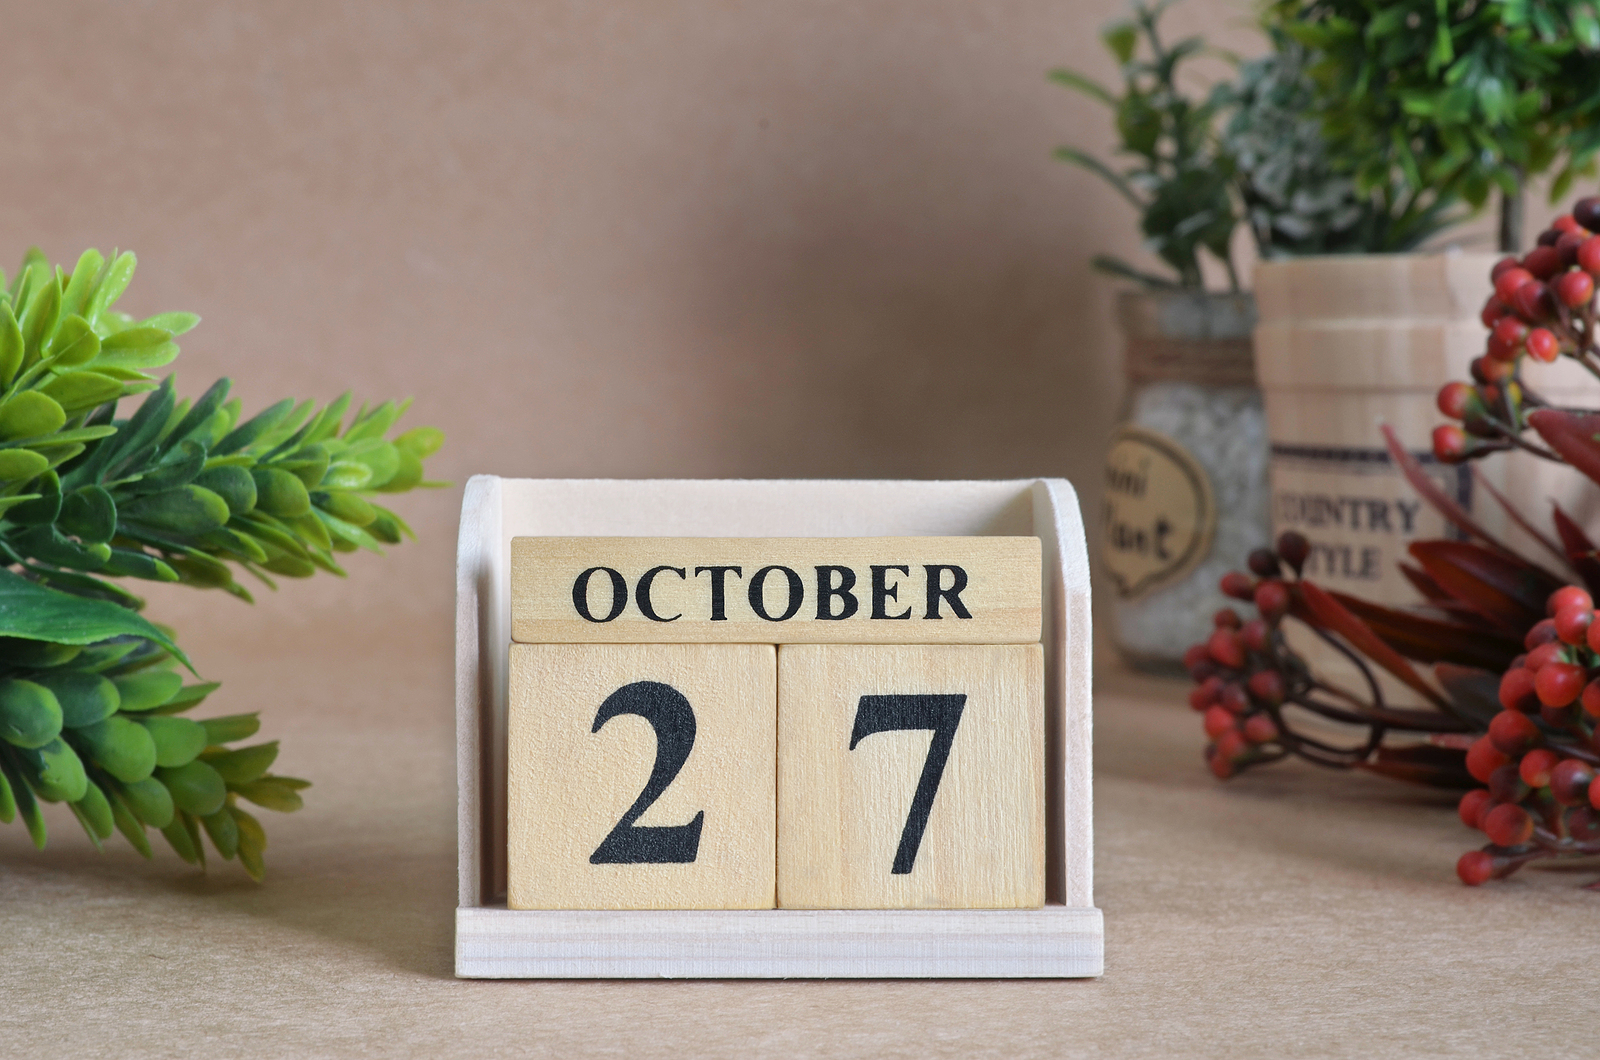 October 27, 2020: Art Shuttle San Francisco – New York